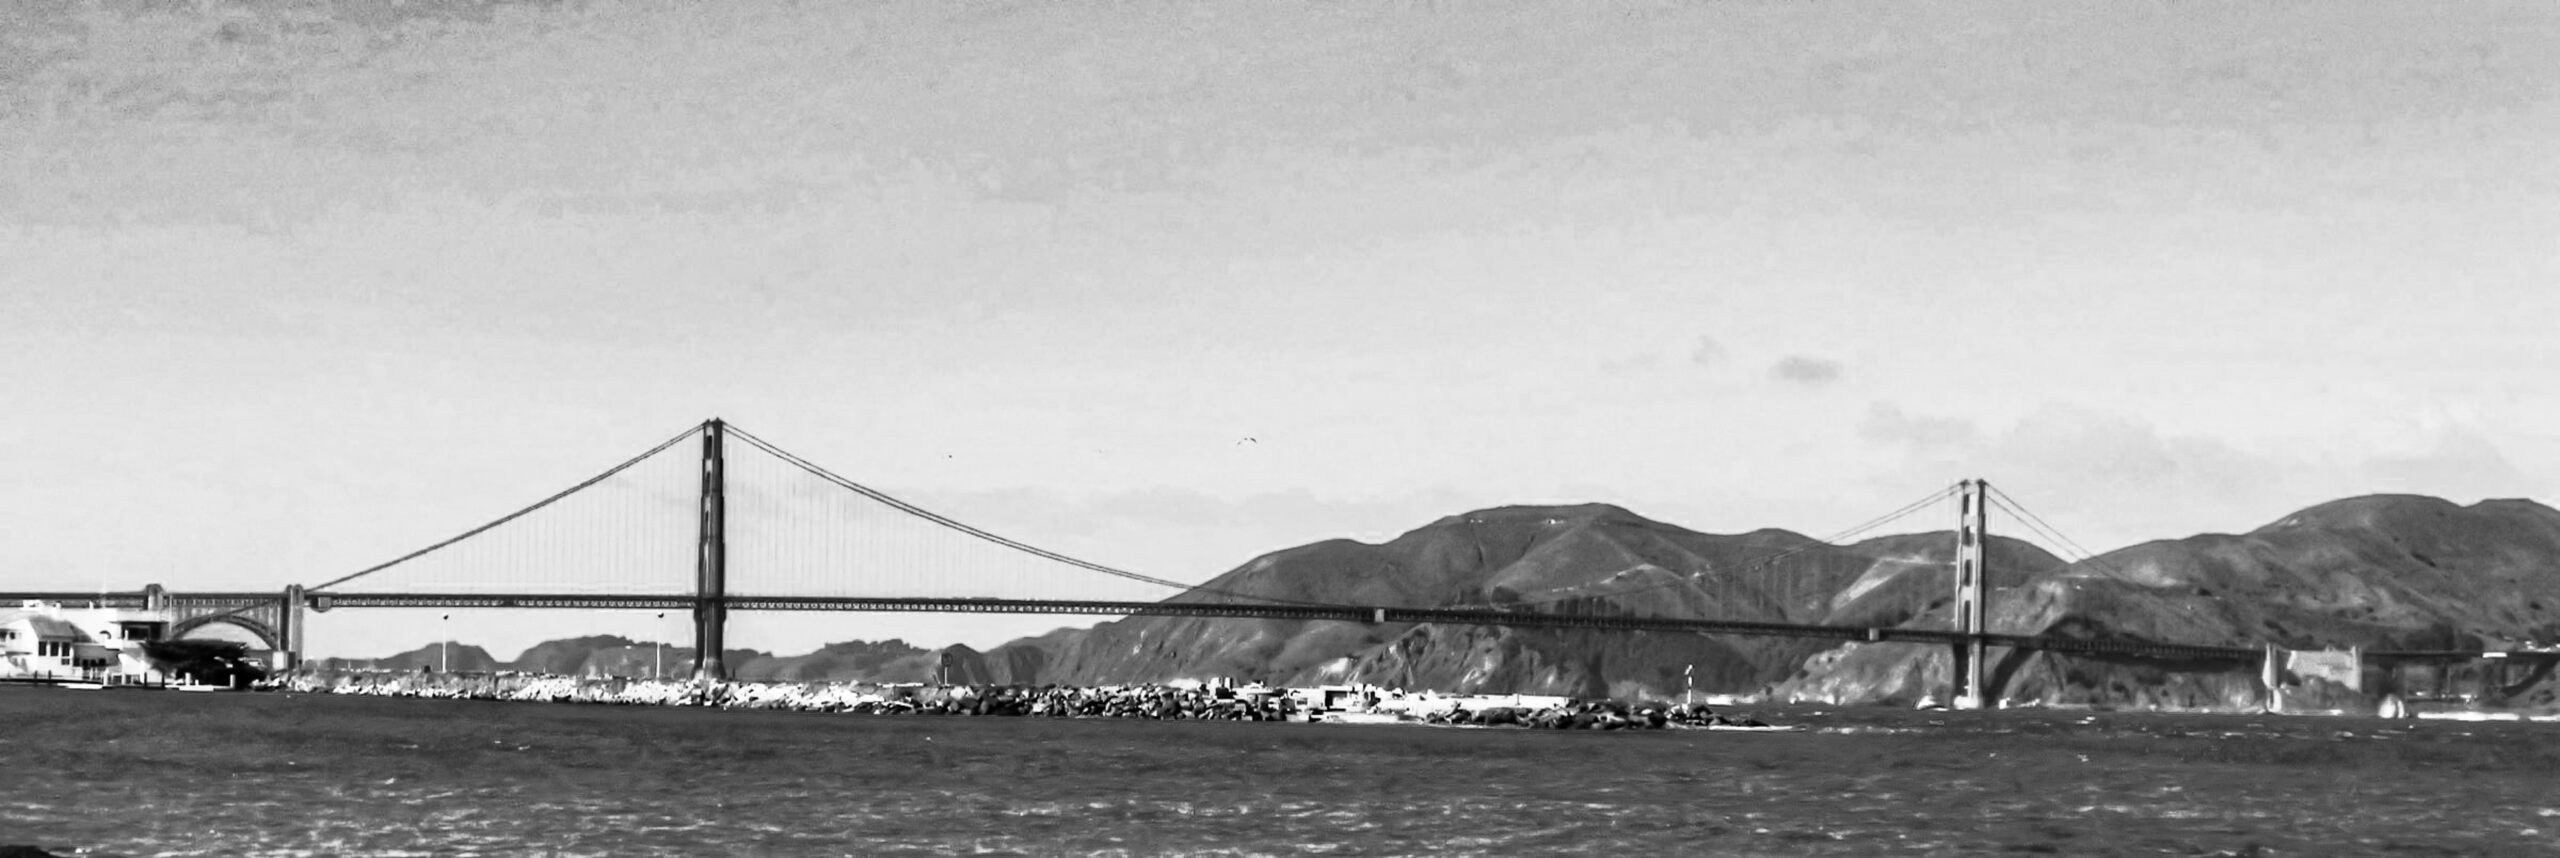 San Francisco Bay, Golden Gate Bridge